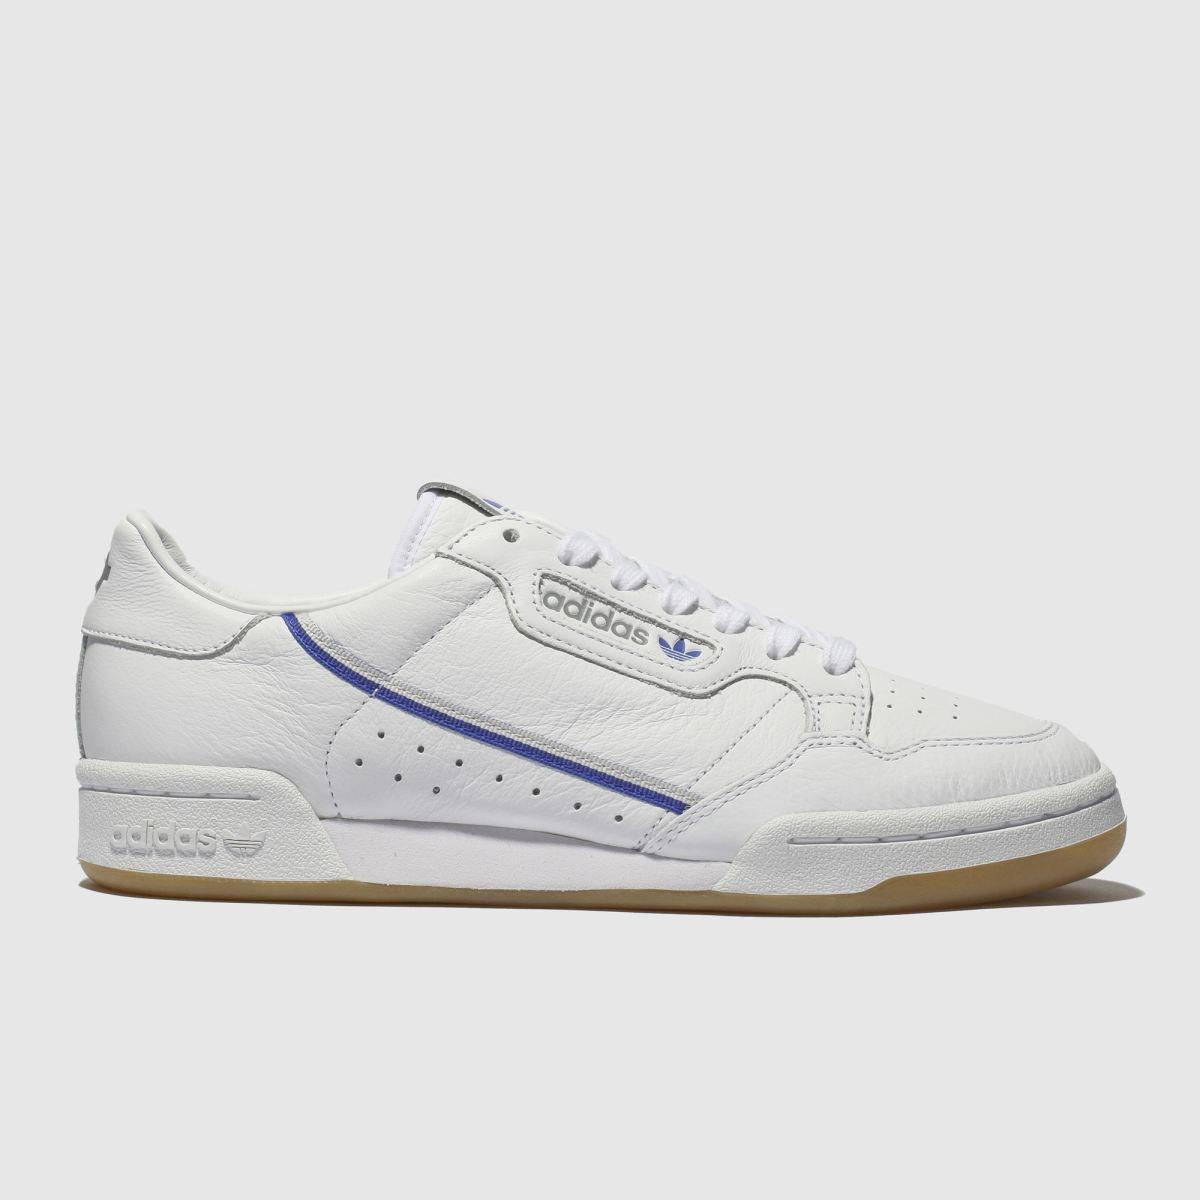 Adidas White & Blue Continental 80 X Tfl Trainers